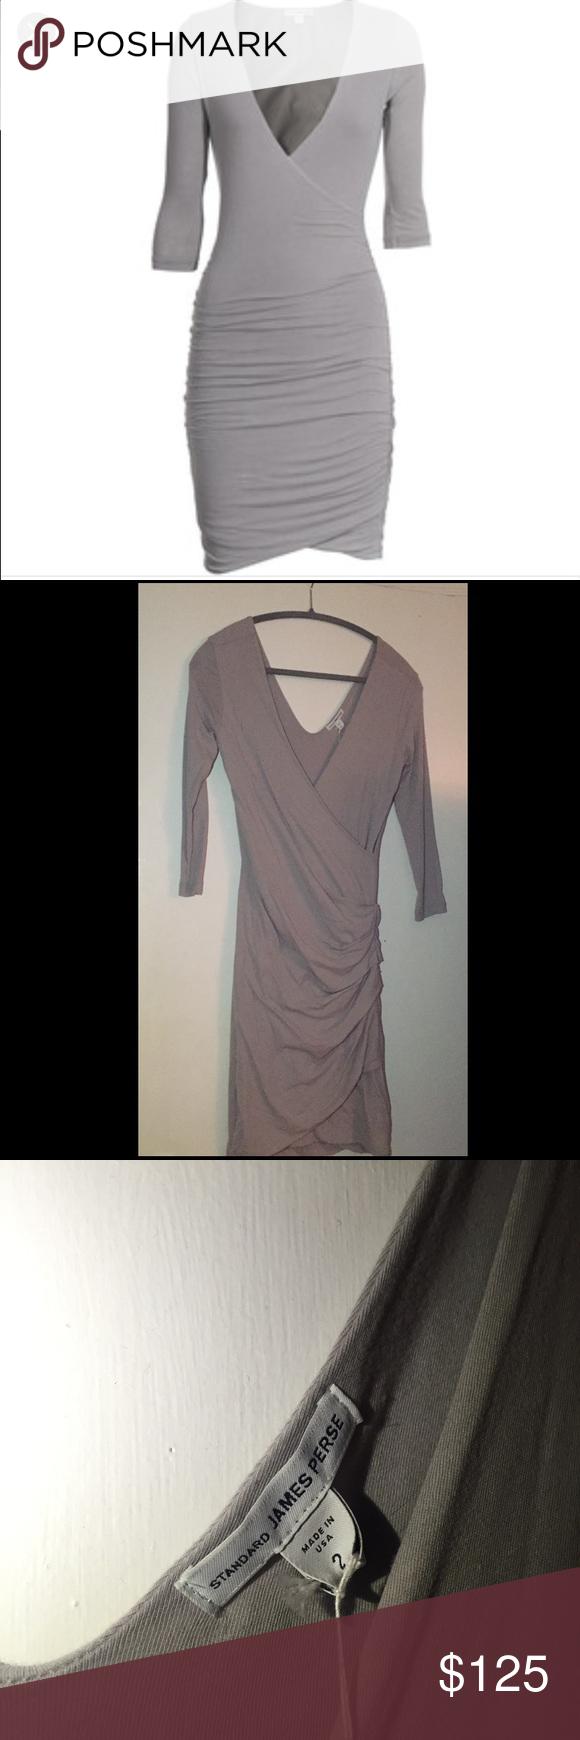 James Perse grey wrap dress Never worn, new with tags, fog grey James Perse dress James Perse Dresses Mini